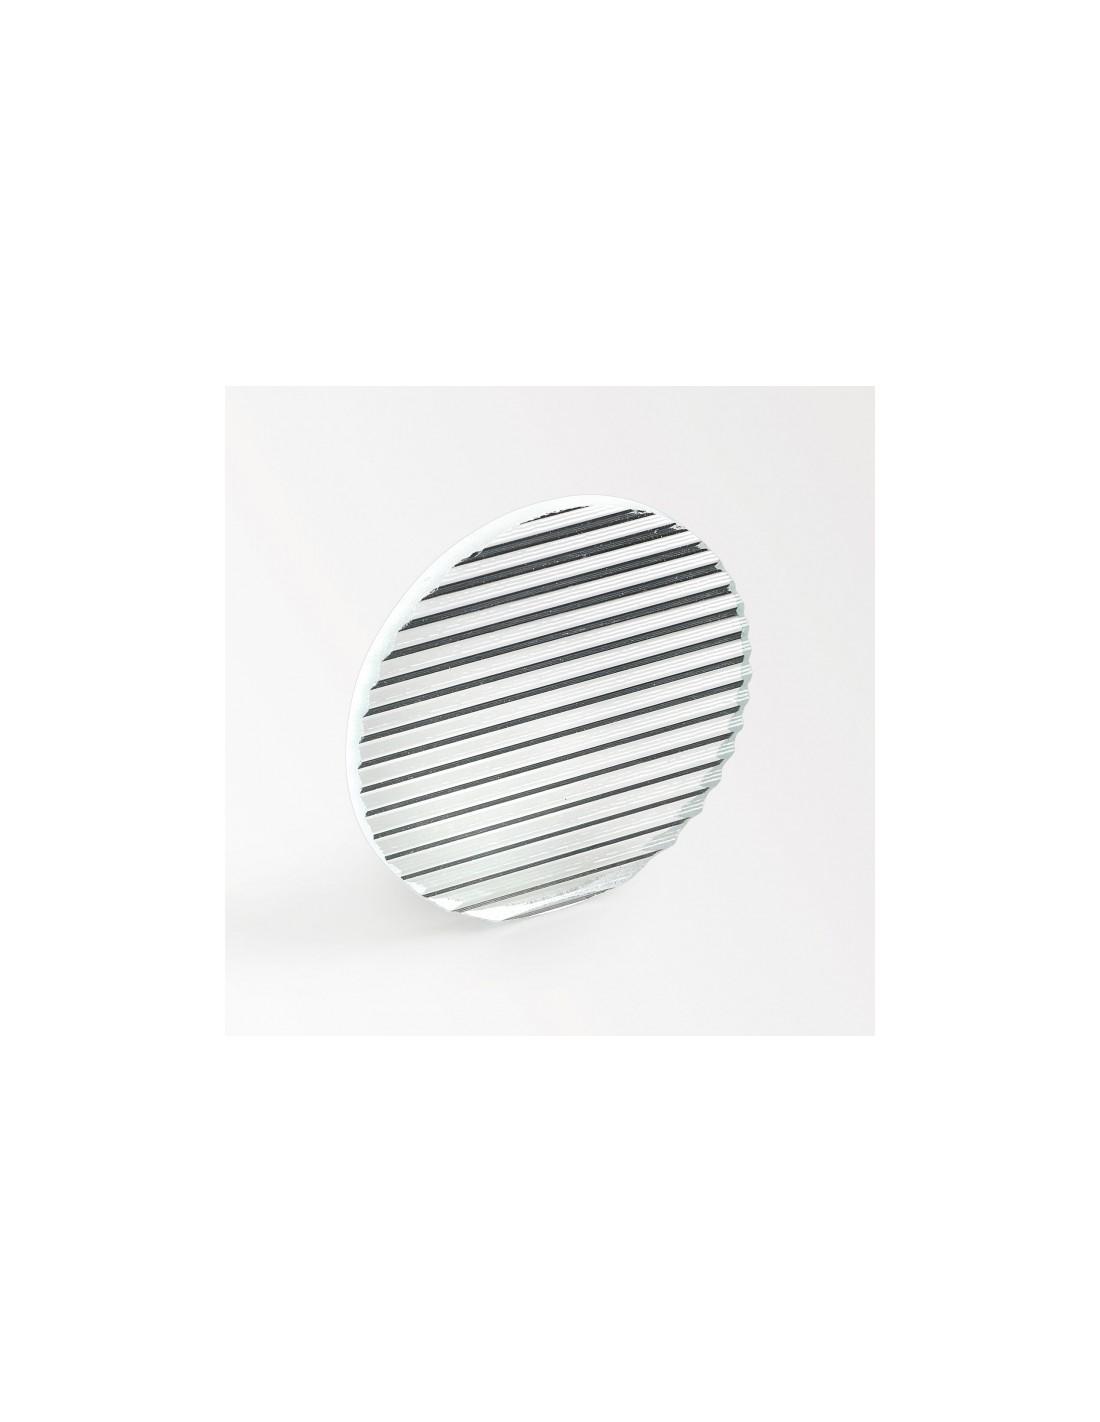 Buy Delta Light Linear Spread Lens 40 Online The Official